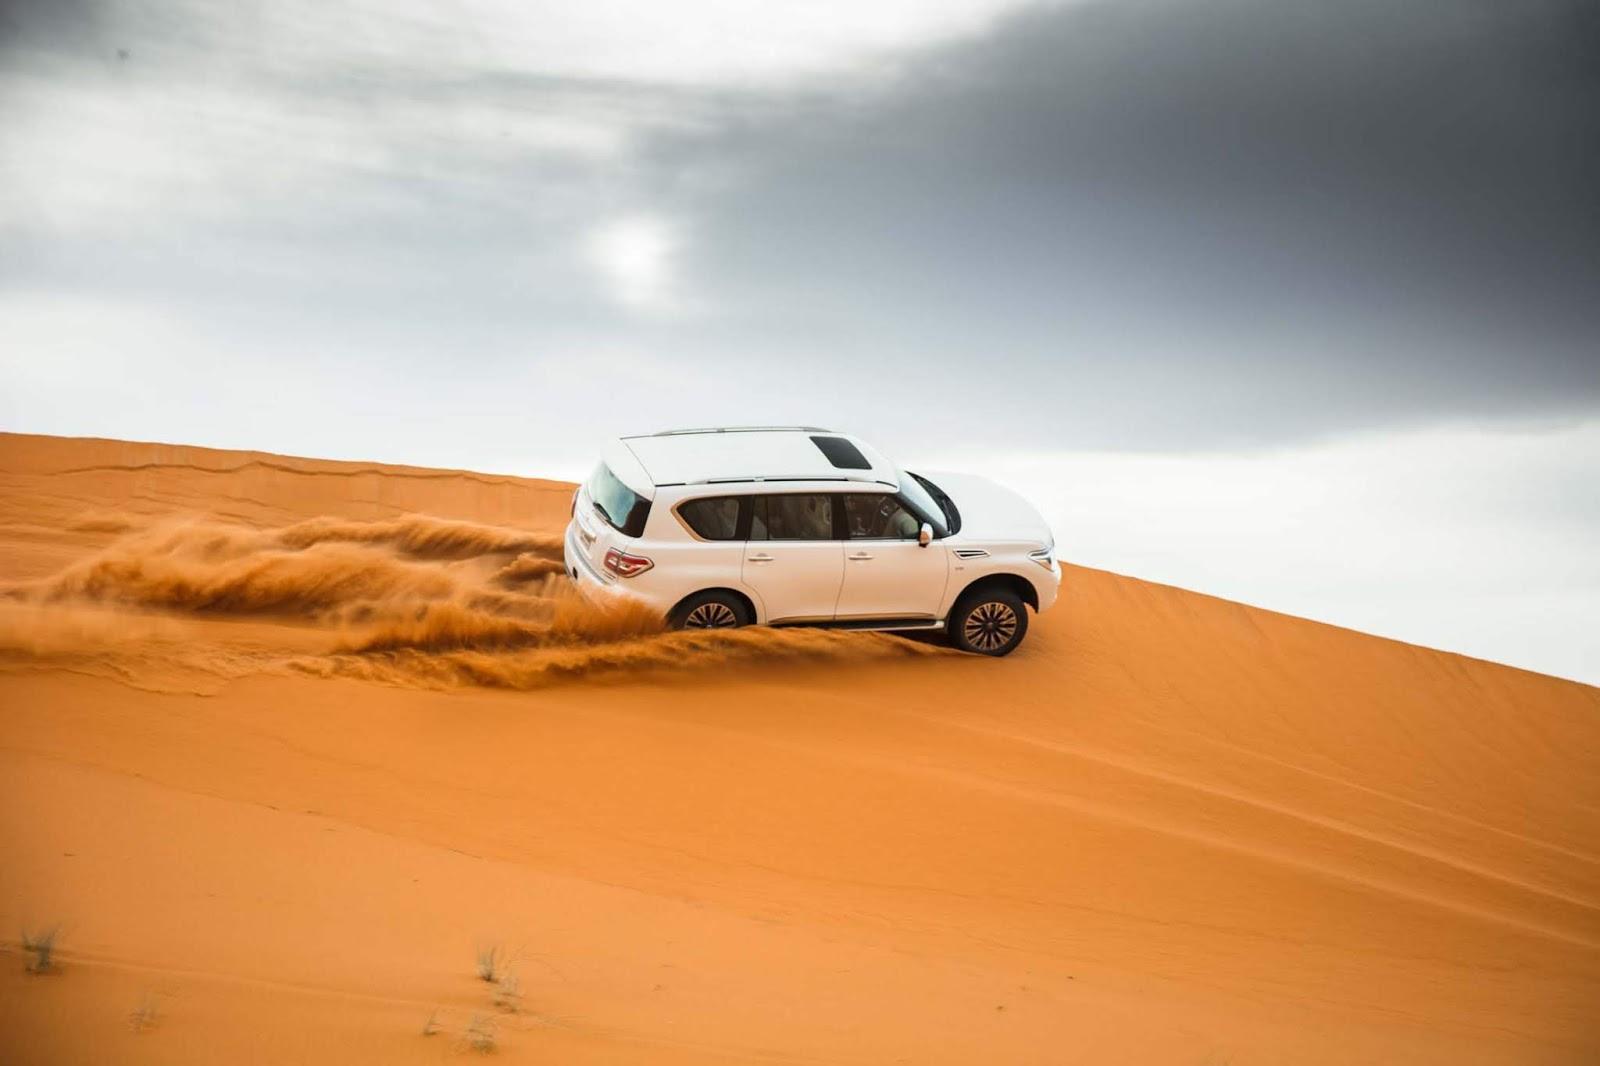 Nissan2BMorocco 2B252862529 Δες τα all terrain οχήματα της Nissan να... δαμάζουν τη Σαχάρα Nissan, Nissan navara, Offroad, video, videos, ΦΩΤΟ